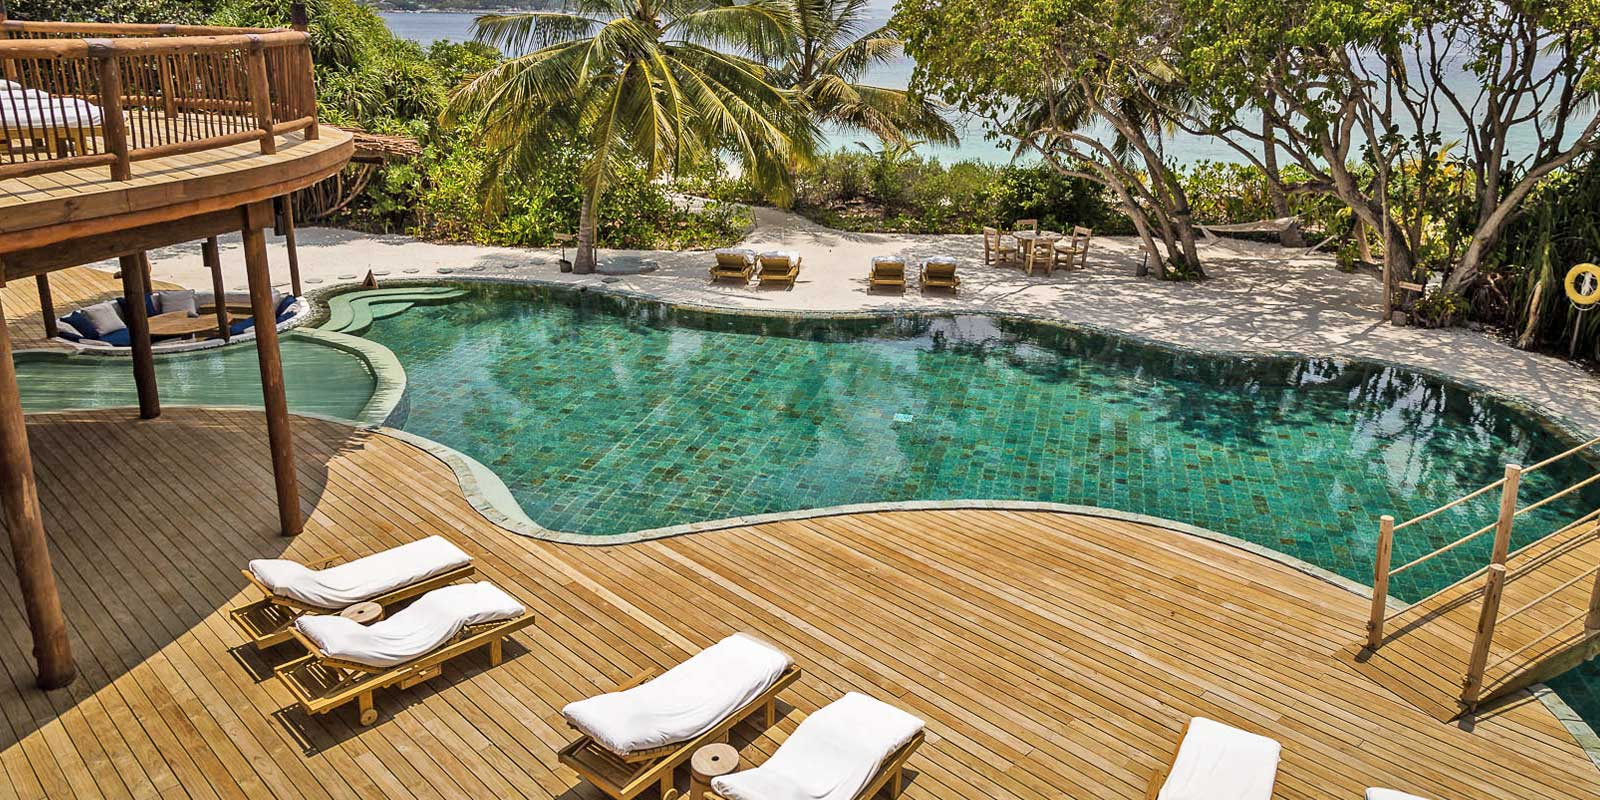 OCOA_SONEVA_FUSHI_RESORT_MALDIVES_14